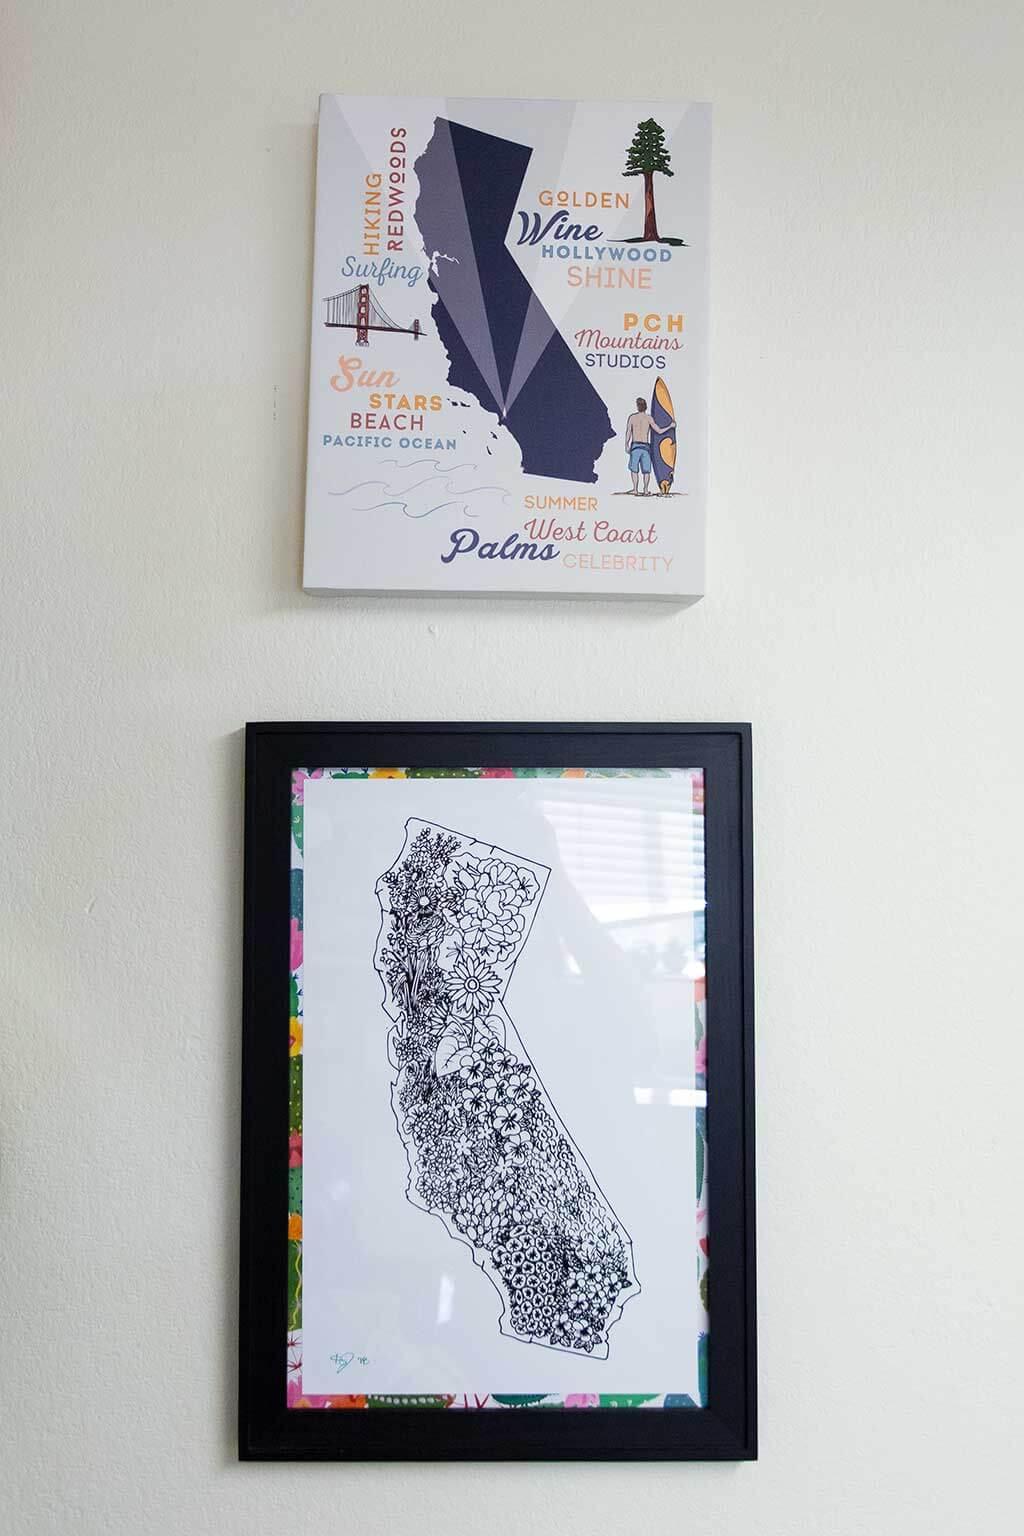 drive-swim-fly-san-juan-bautista-california-willis-cottage-kitchen-california-state-artwork